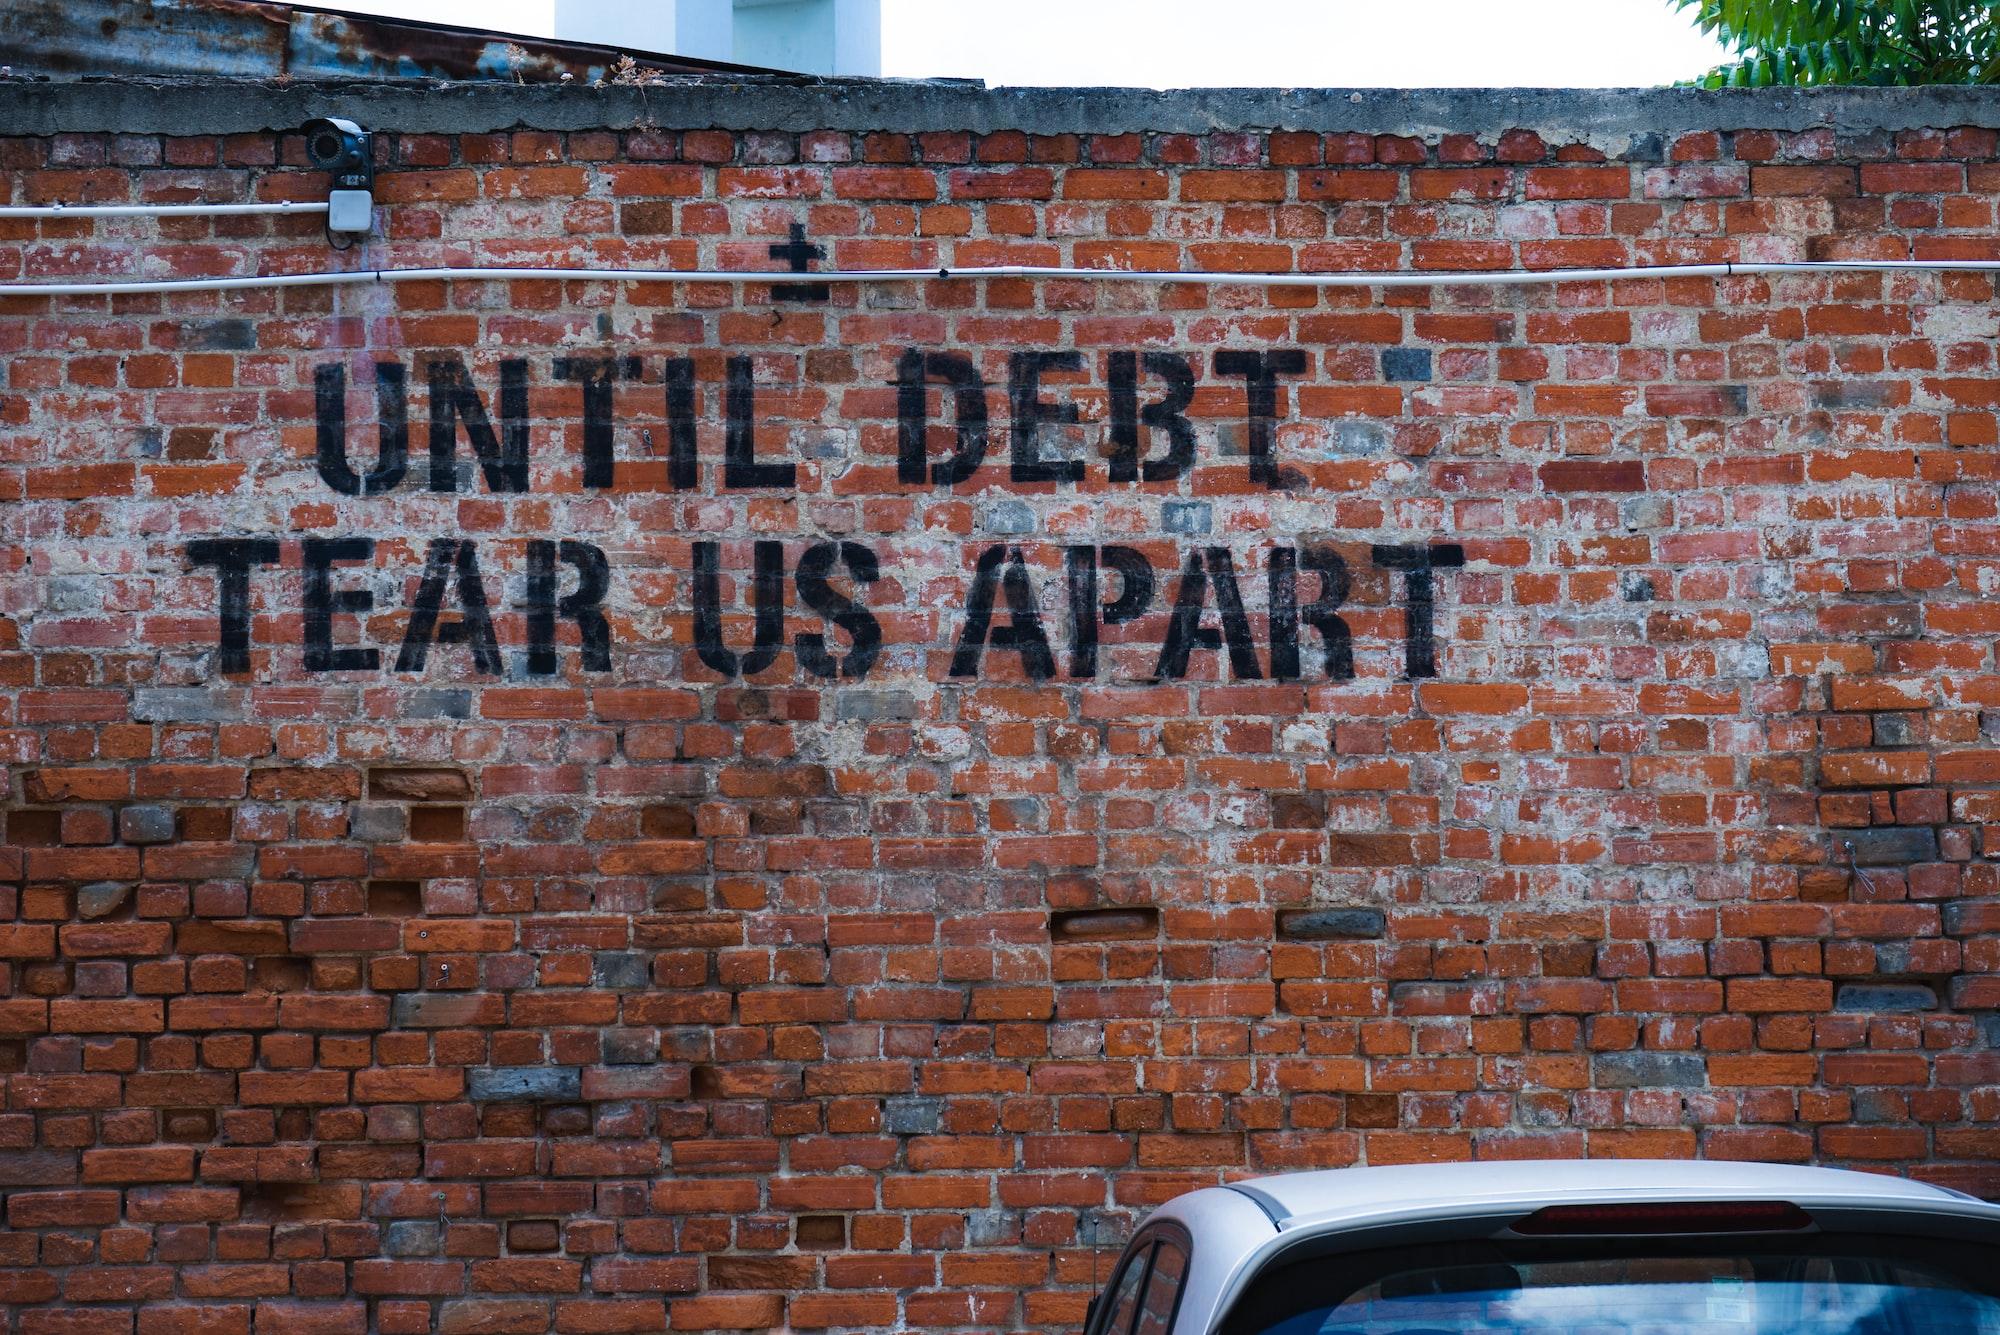 L'economia toscana dopo la pandemia